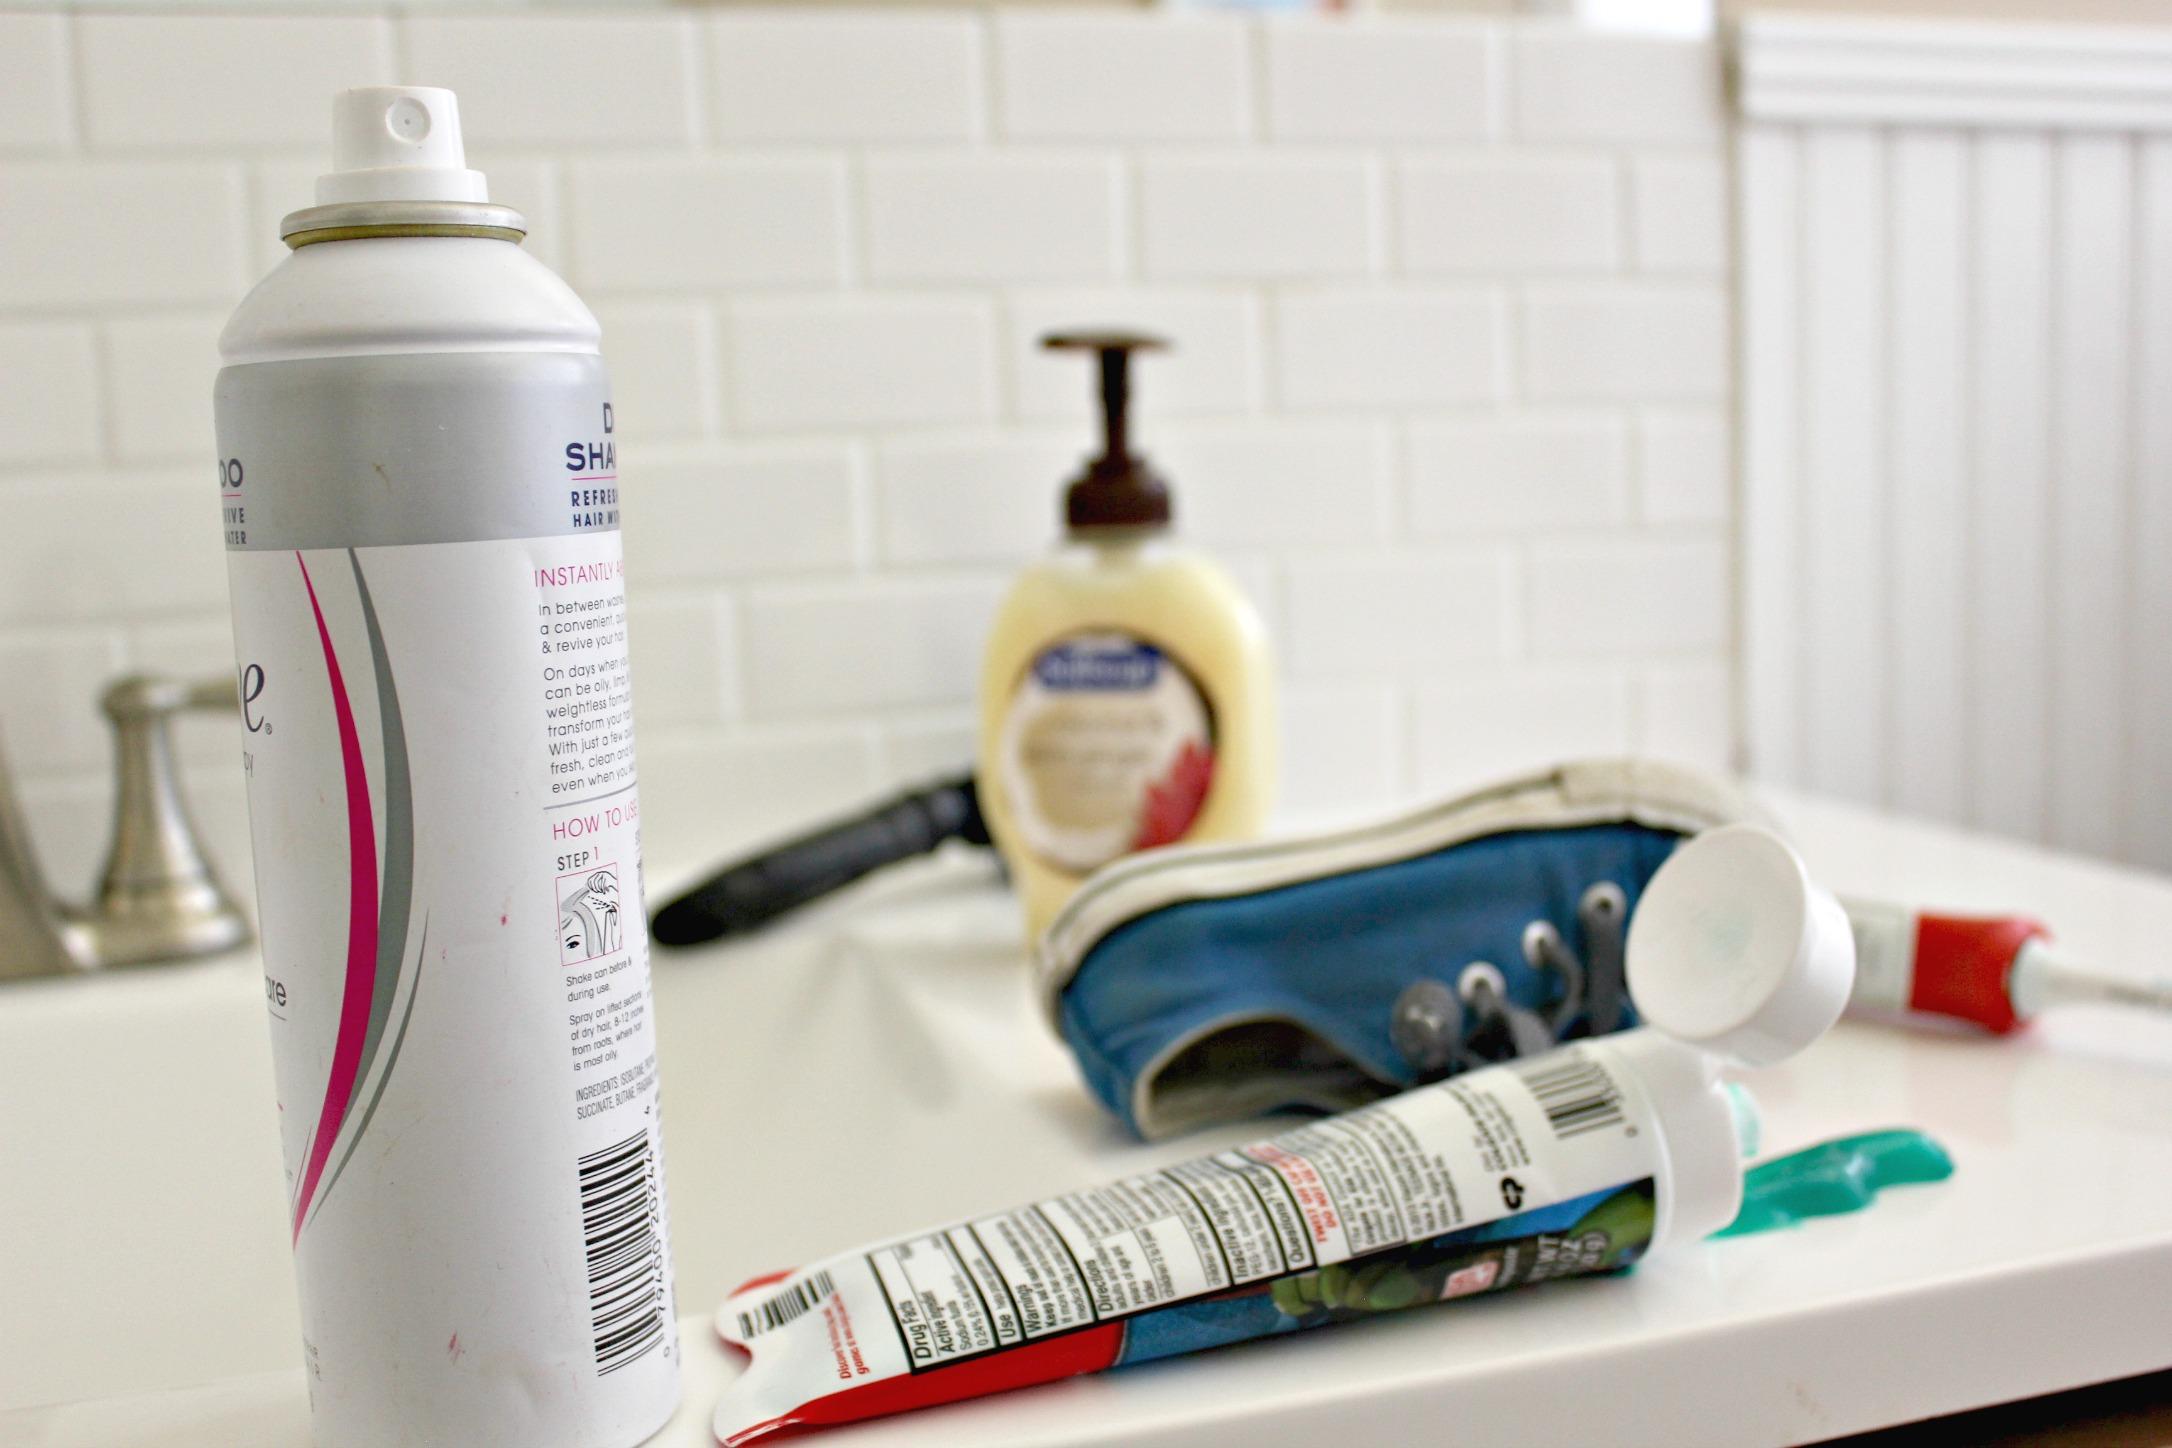 Dear Dry Shampoo, You Complete Me. SheJustGlows.com